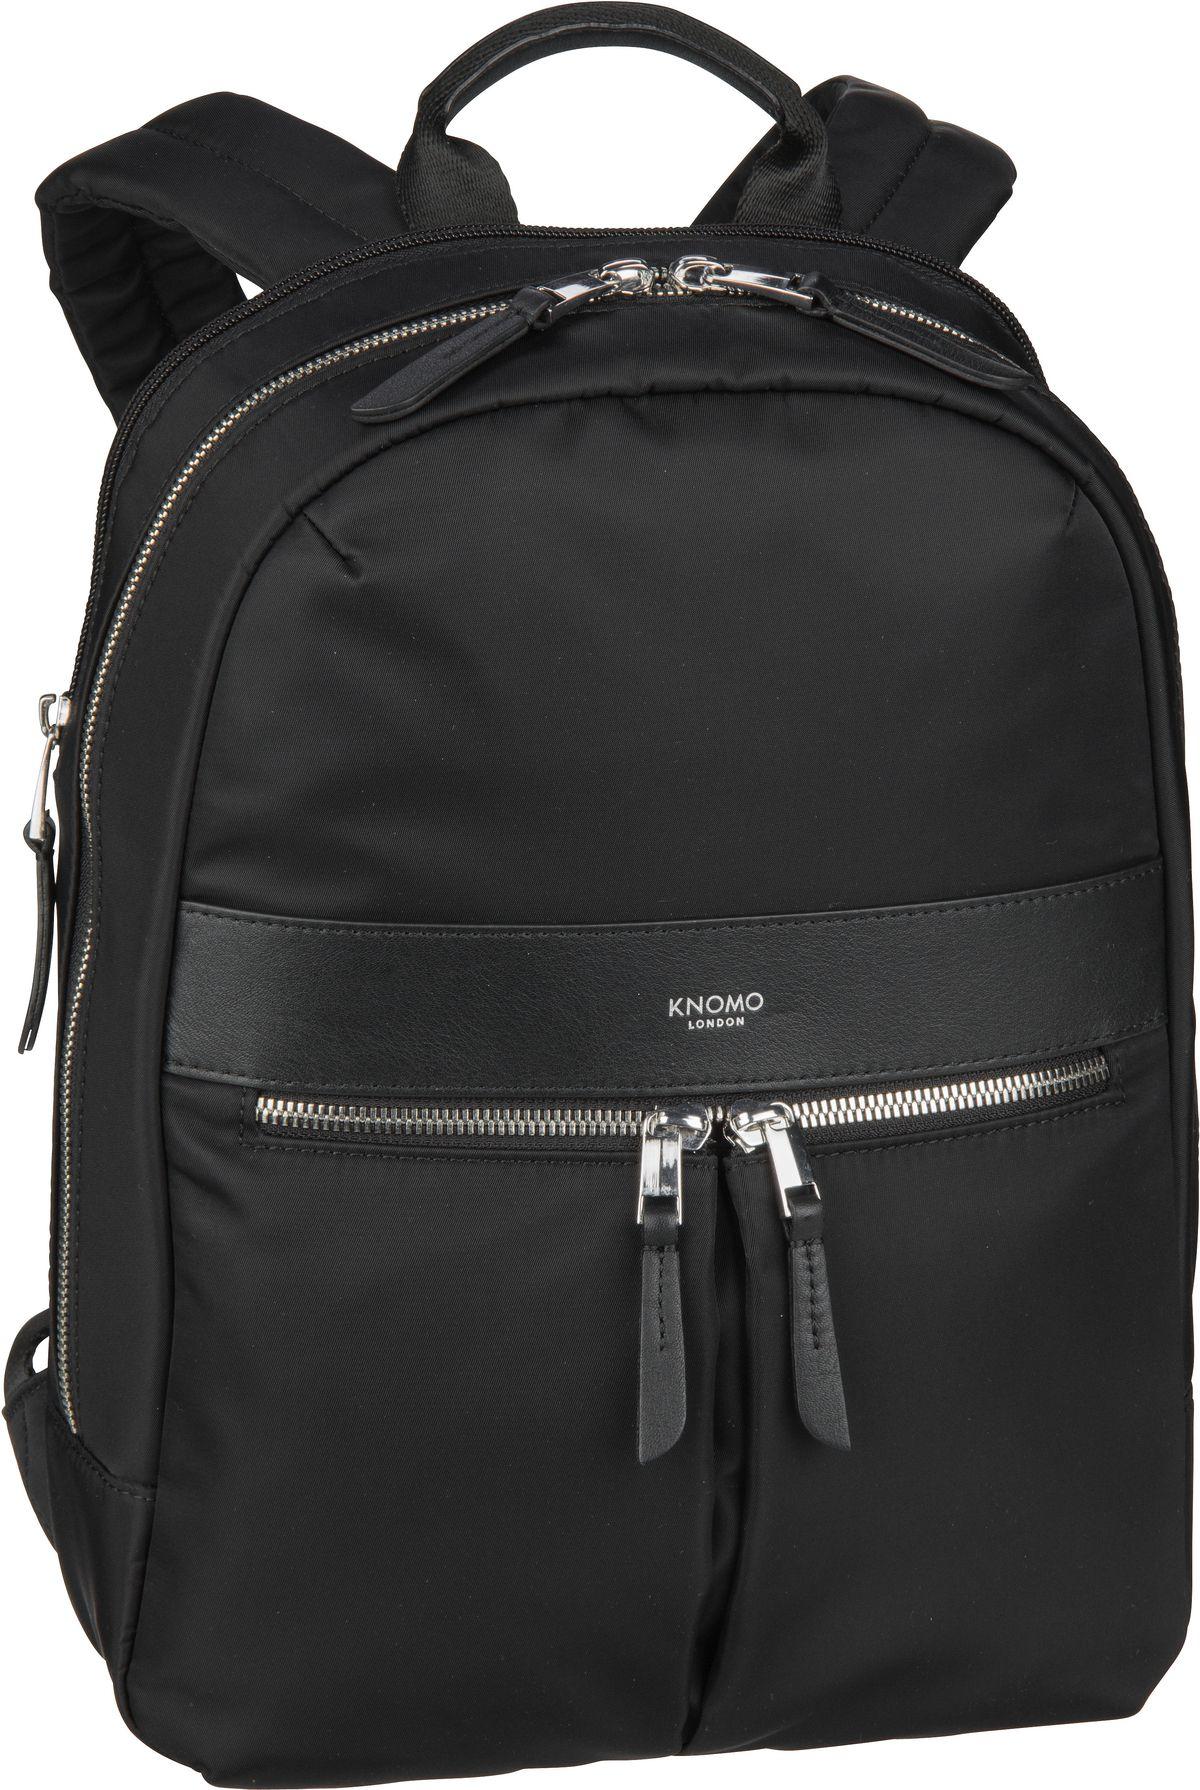 Rucksack / Daypack Mayfair Mini Beaufort Backpack 12'' Black/Silver